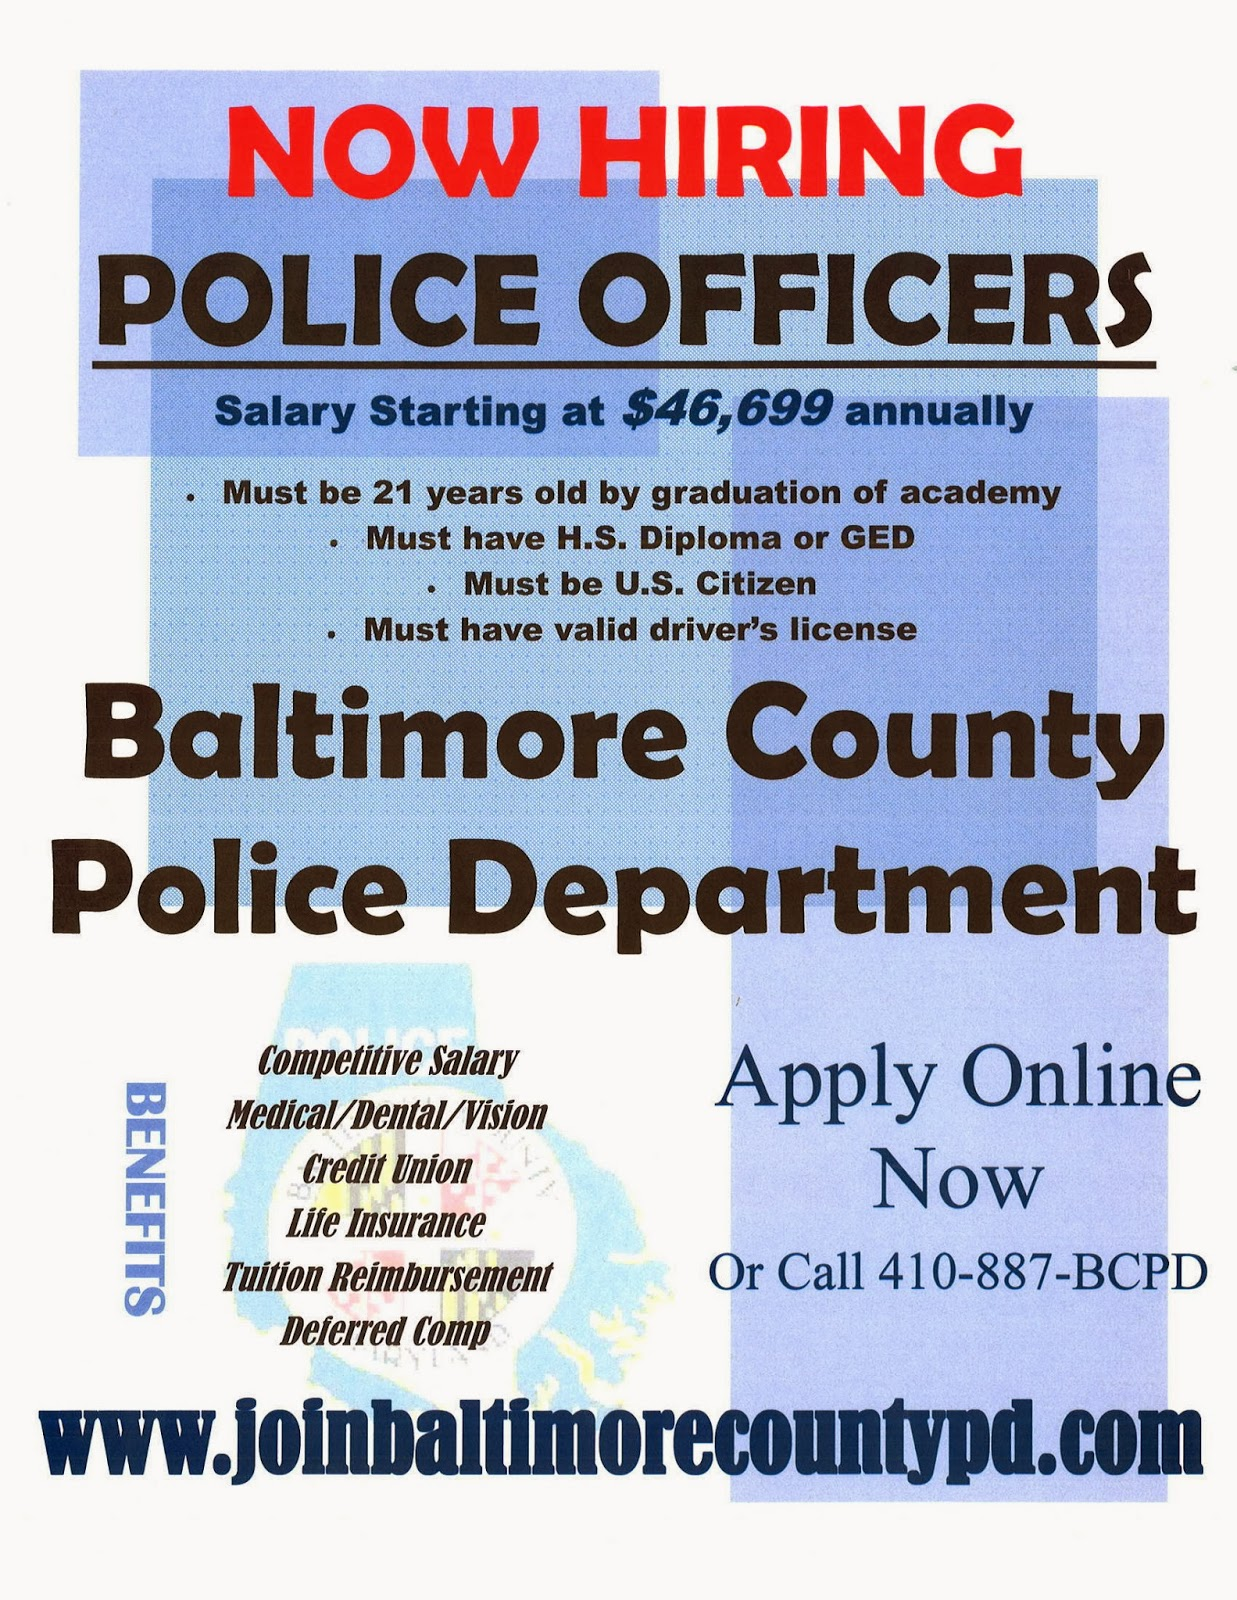 ccjs undergrad blog baltimore county police department now hiring. Black Bedroom Furniture Sets. Home Design Ideas